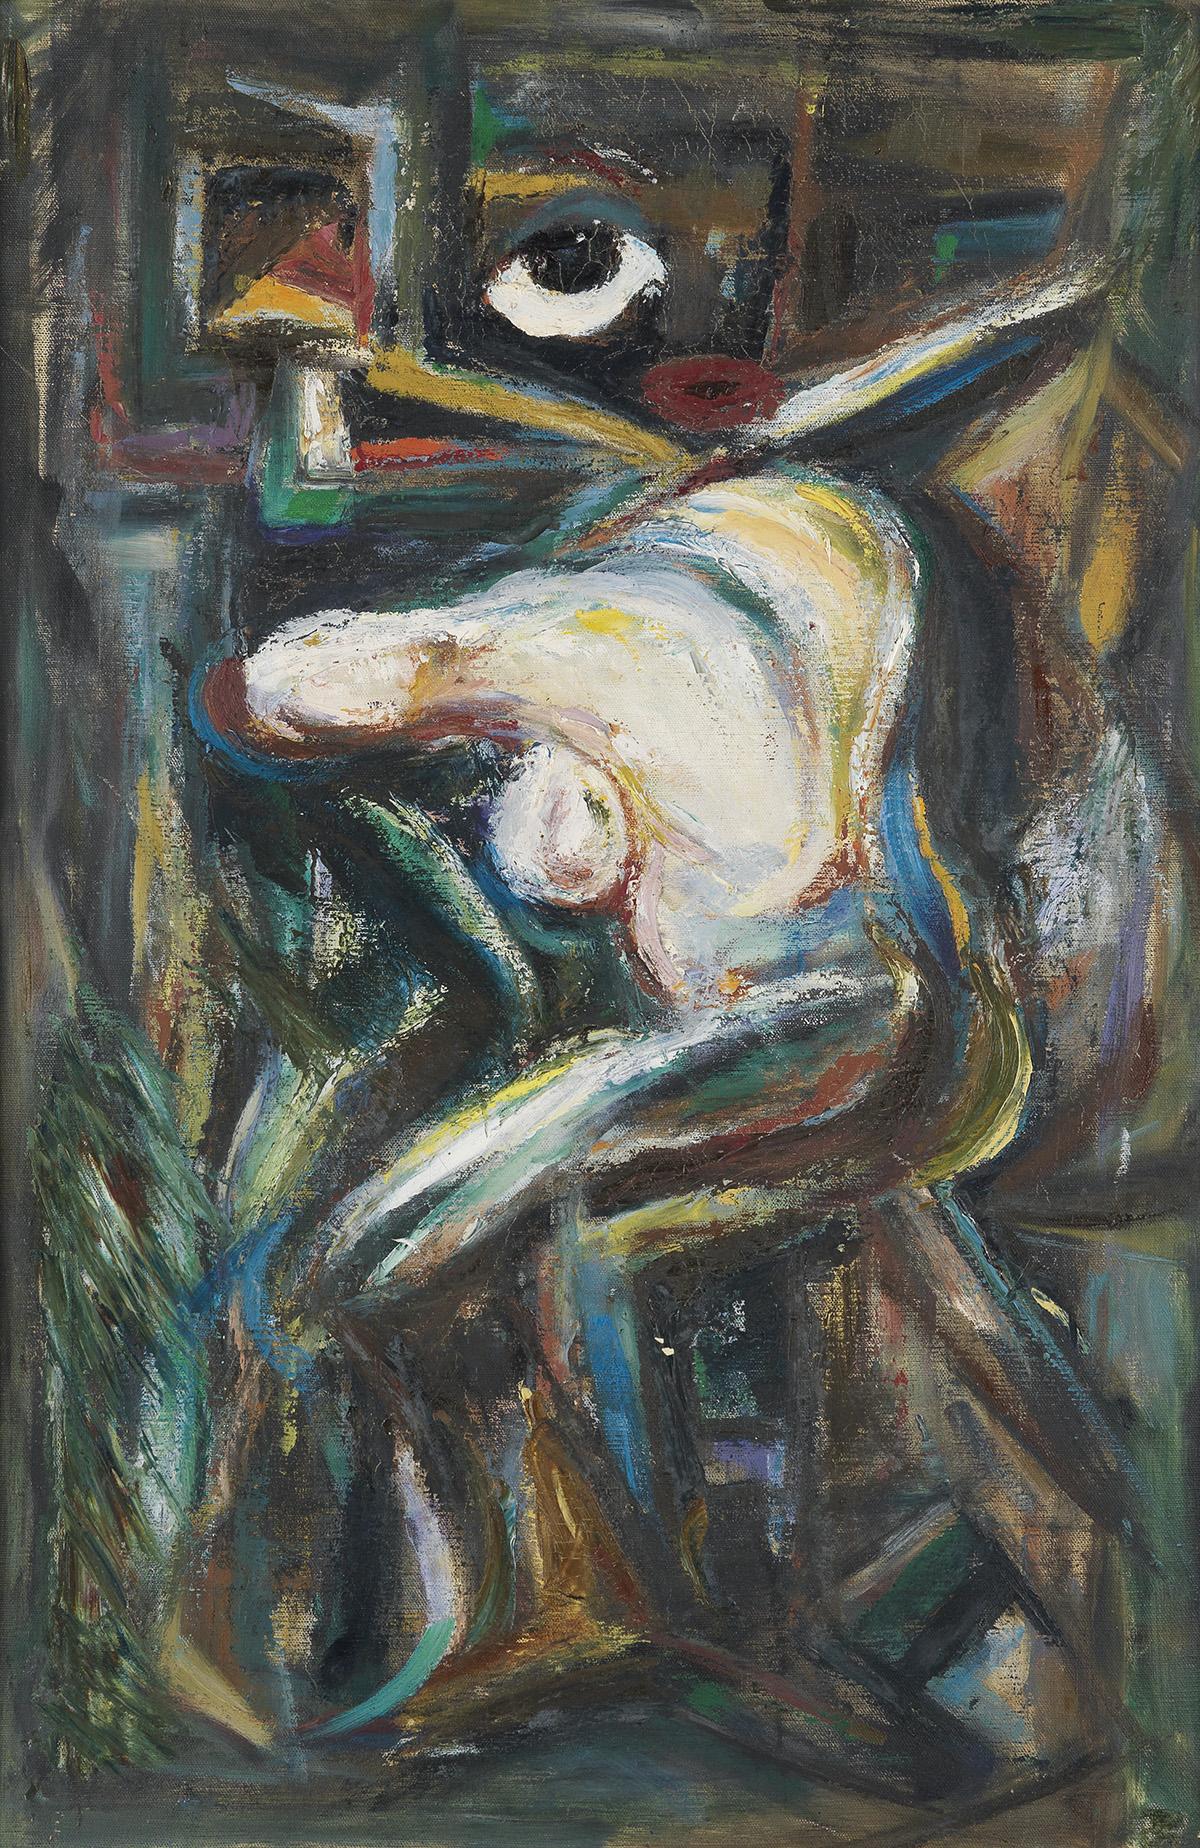 DOX THRASH (1892 - 1965) Seated Nude with an Eye.